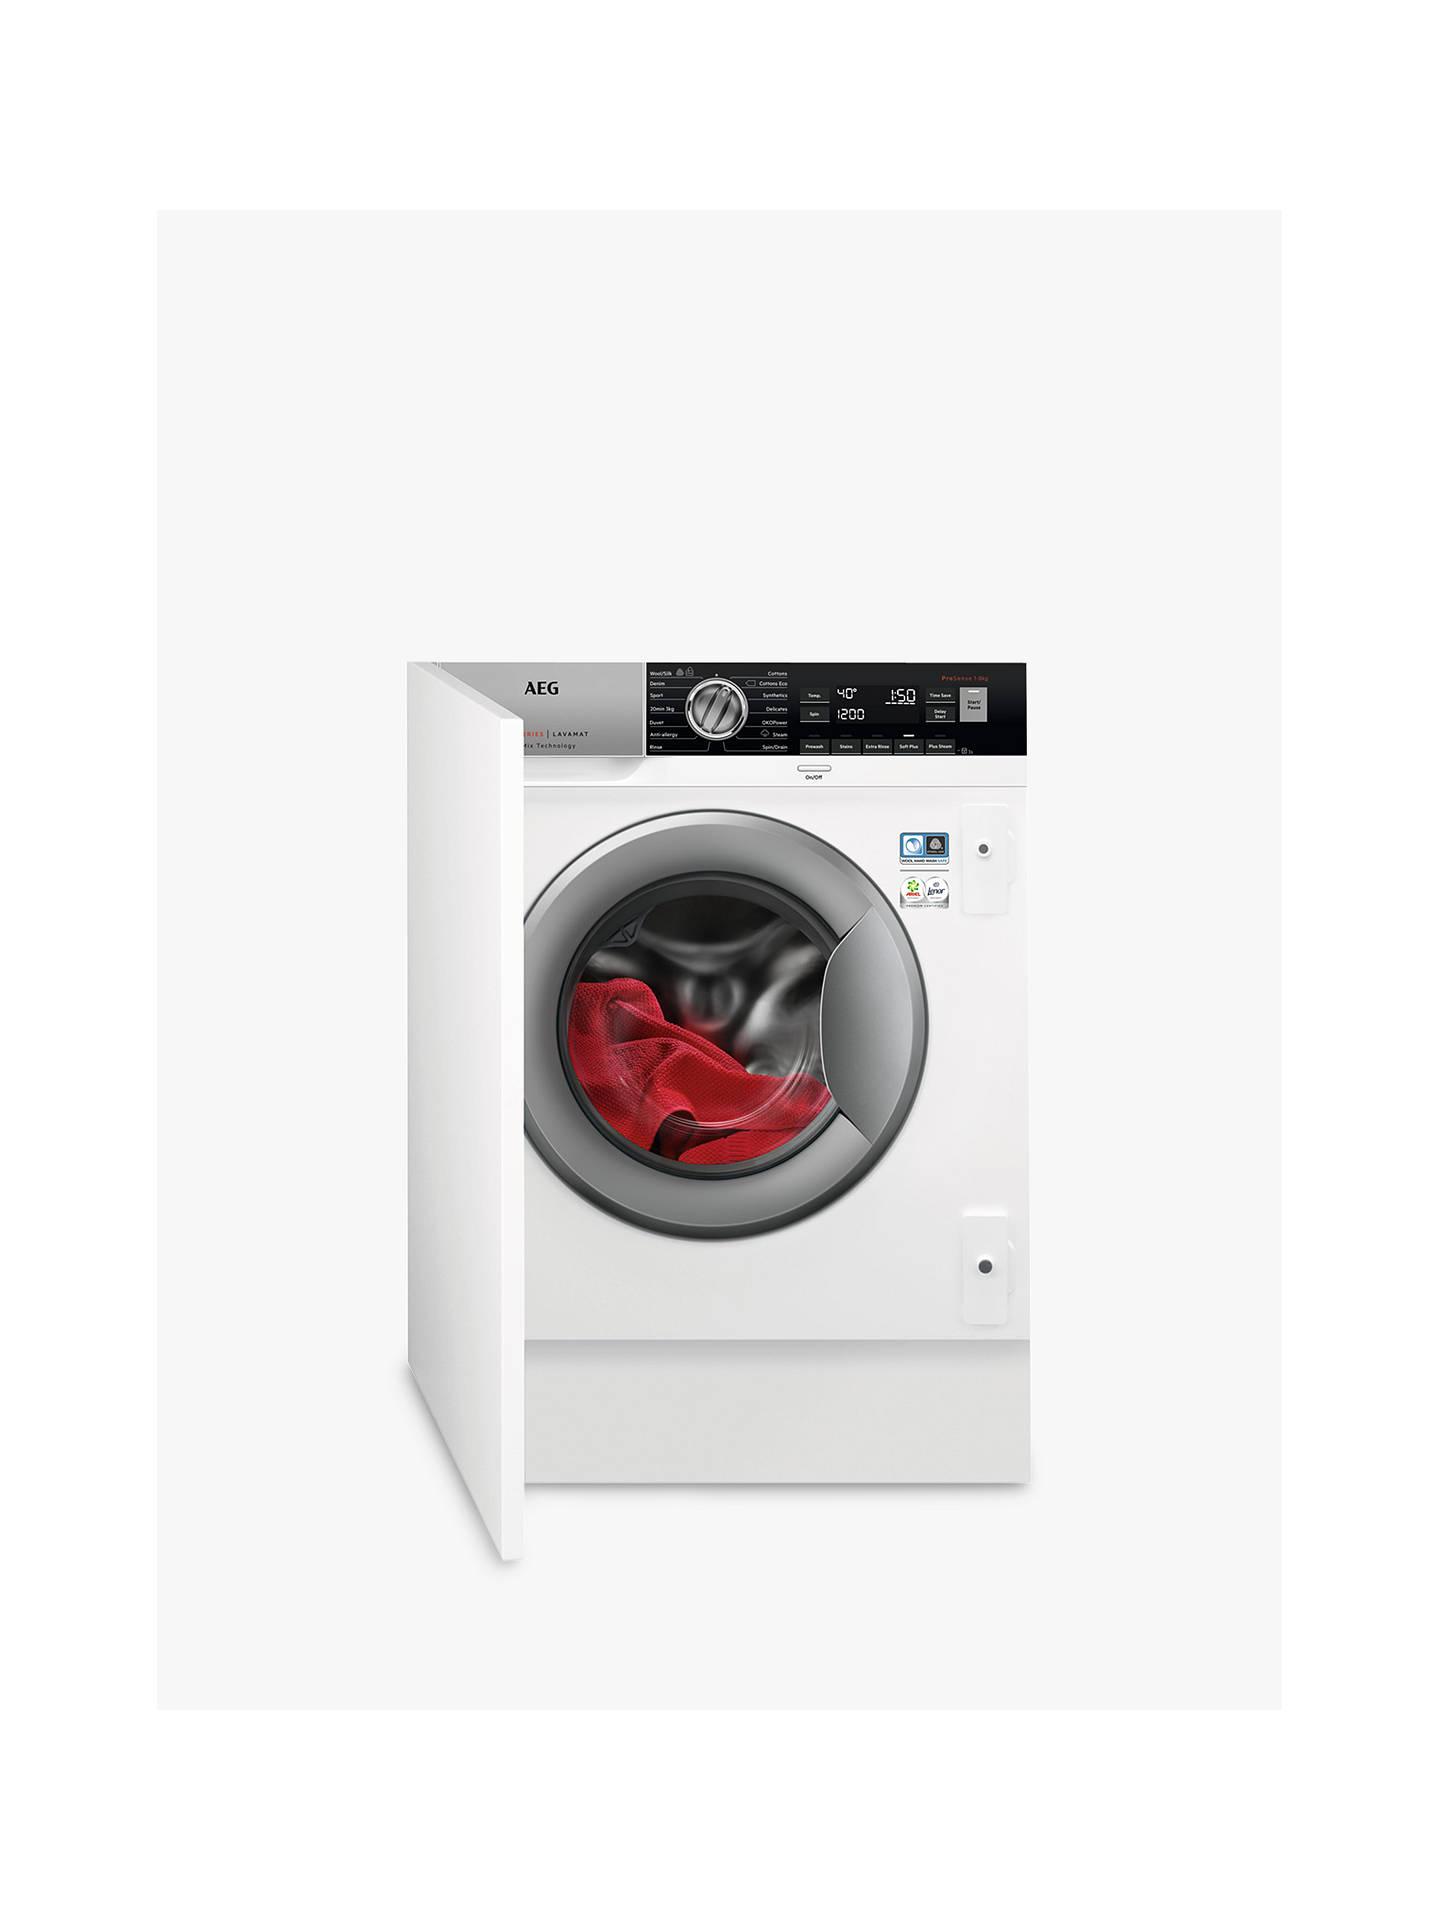 AEG ProSteam Technology L8FC8432BI Integrated Washing Machine, 8kg on